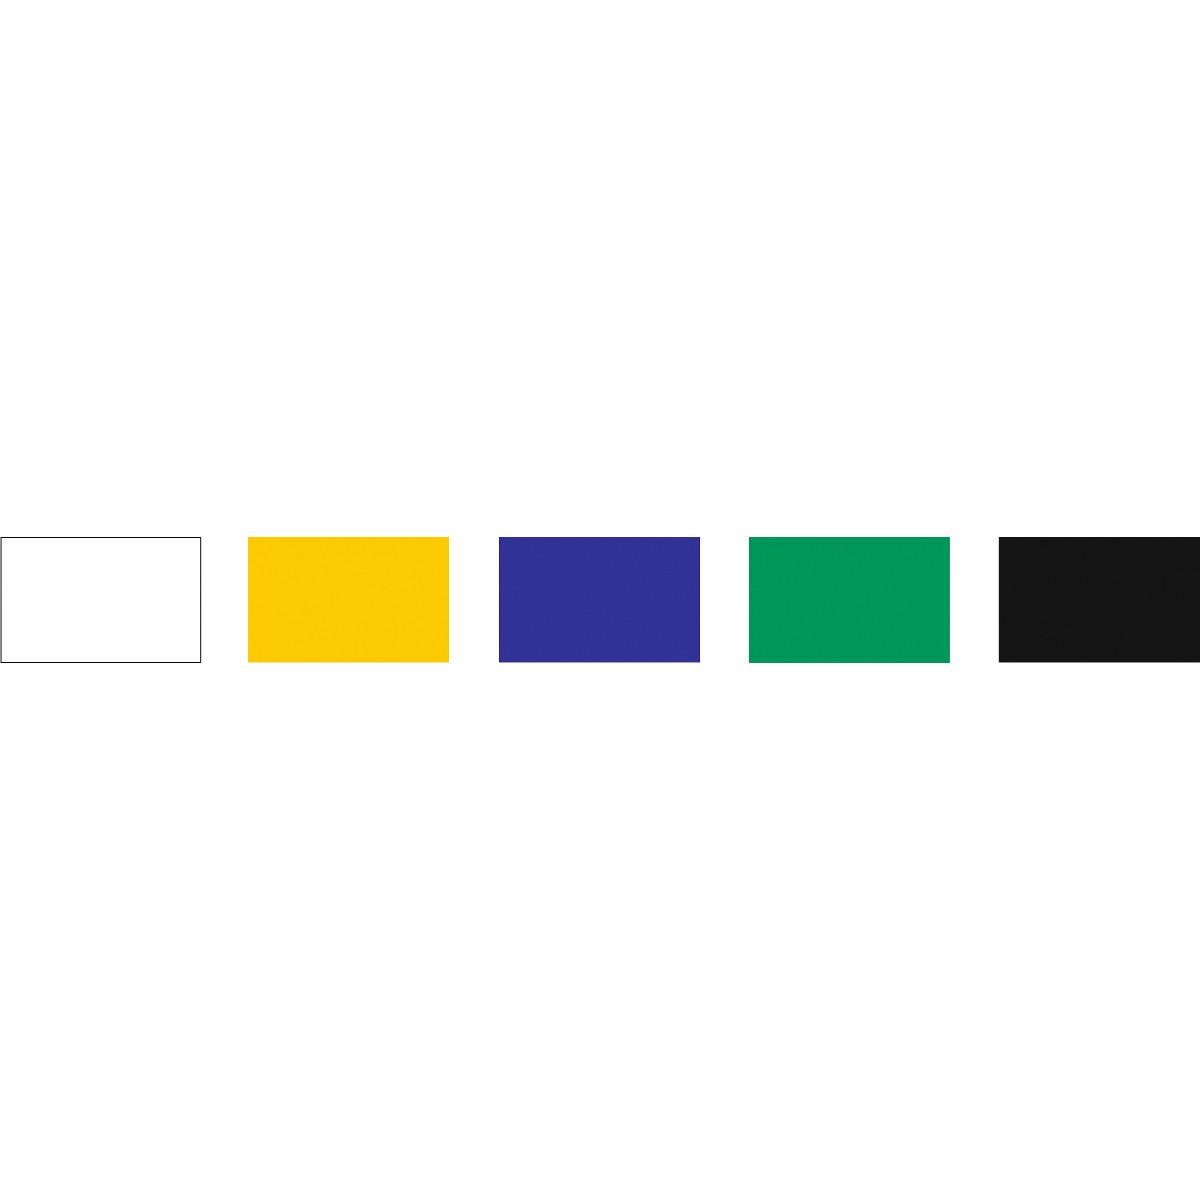 Farbige Fensterfolie 23 x 33 cm - 14 Blatt sortiert